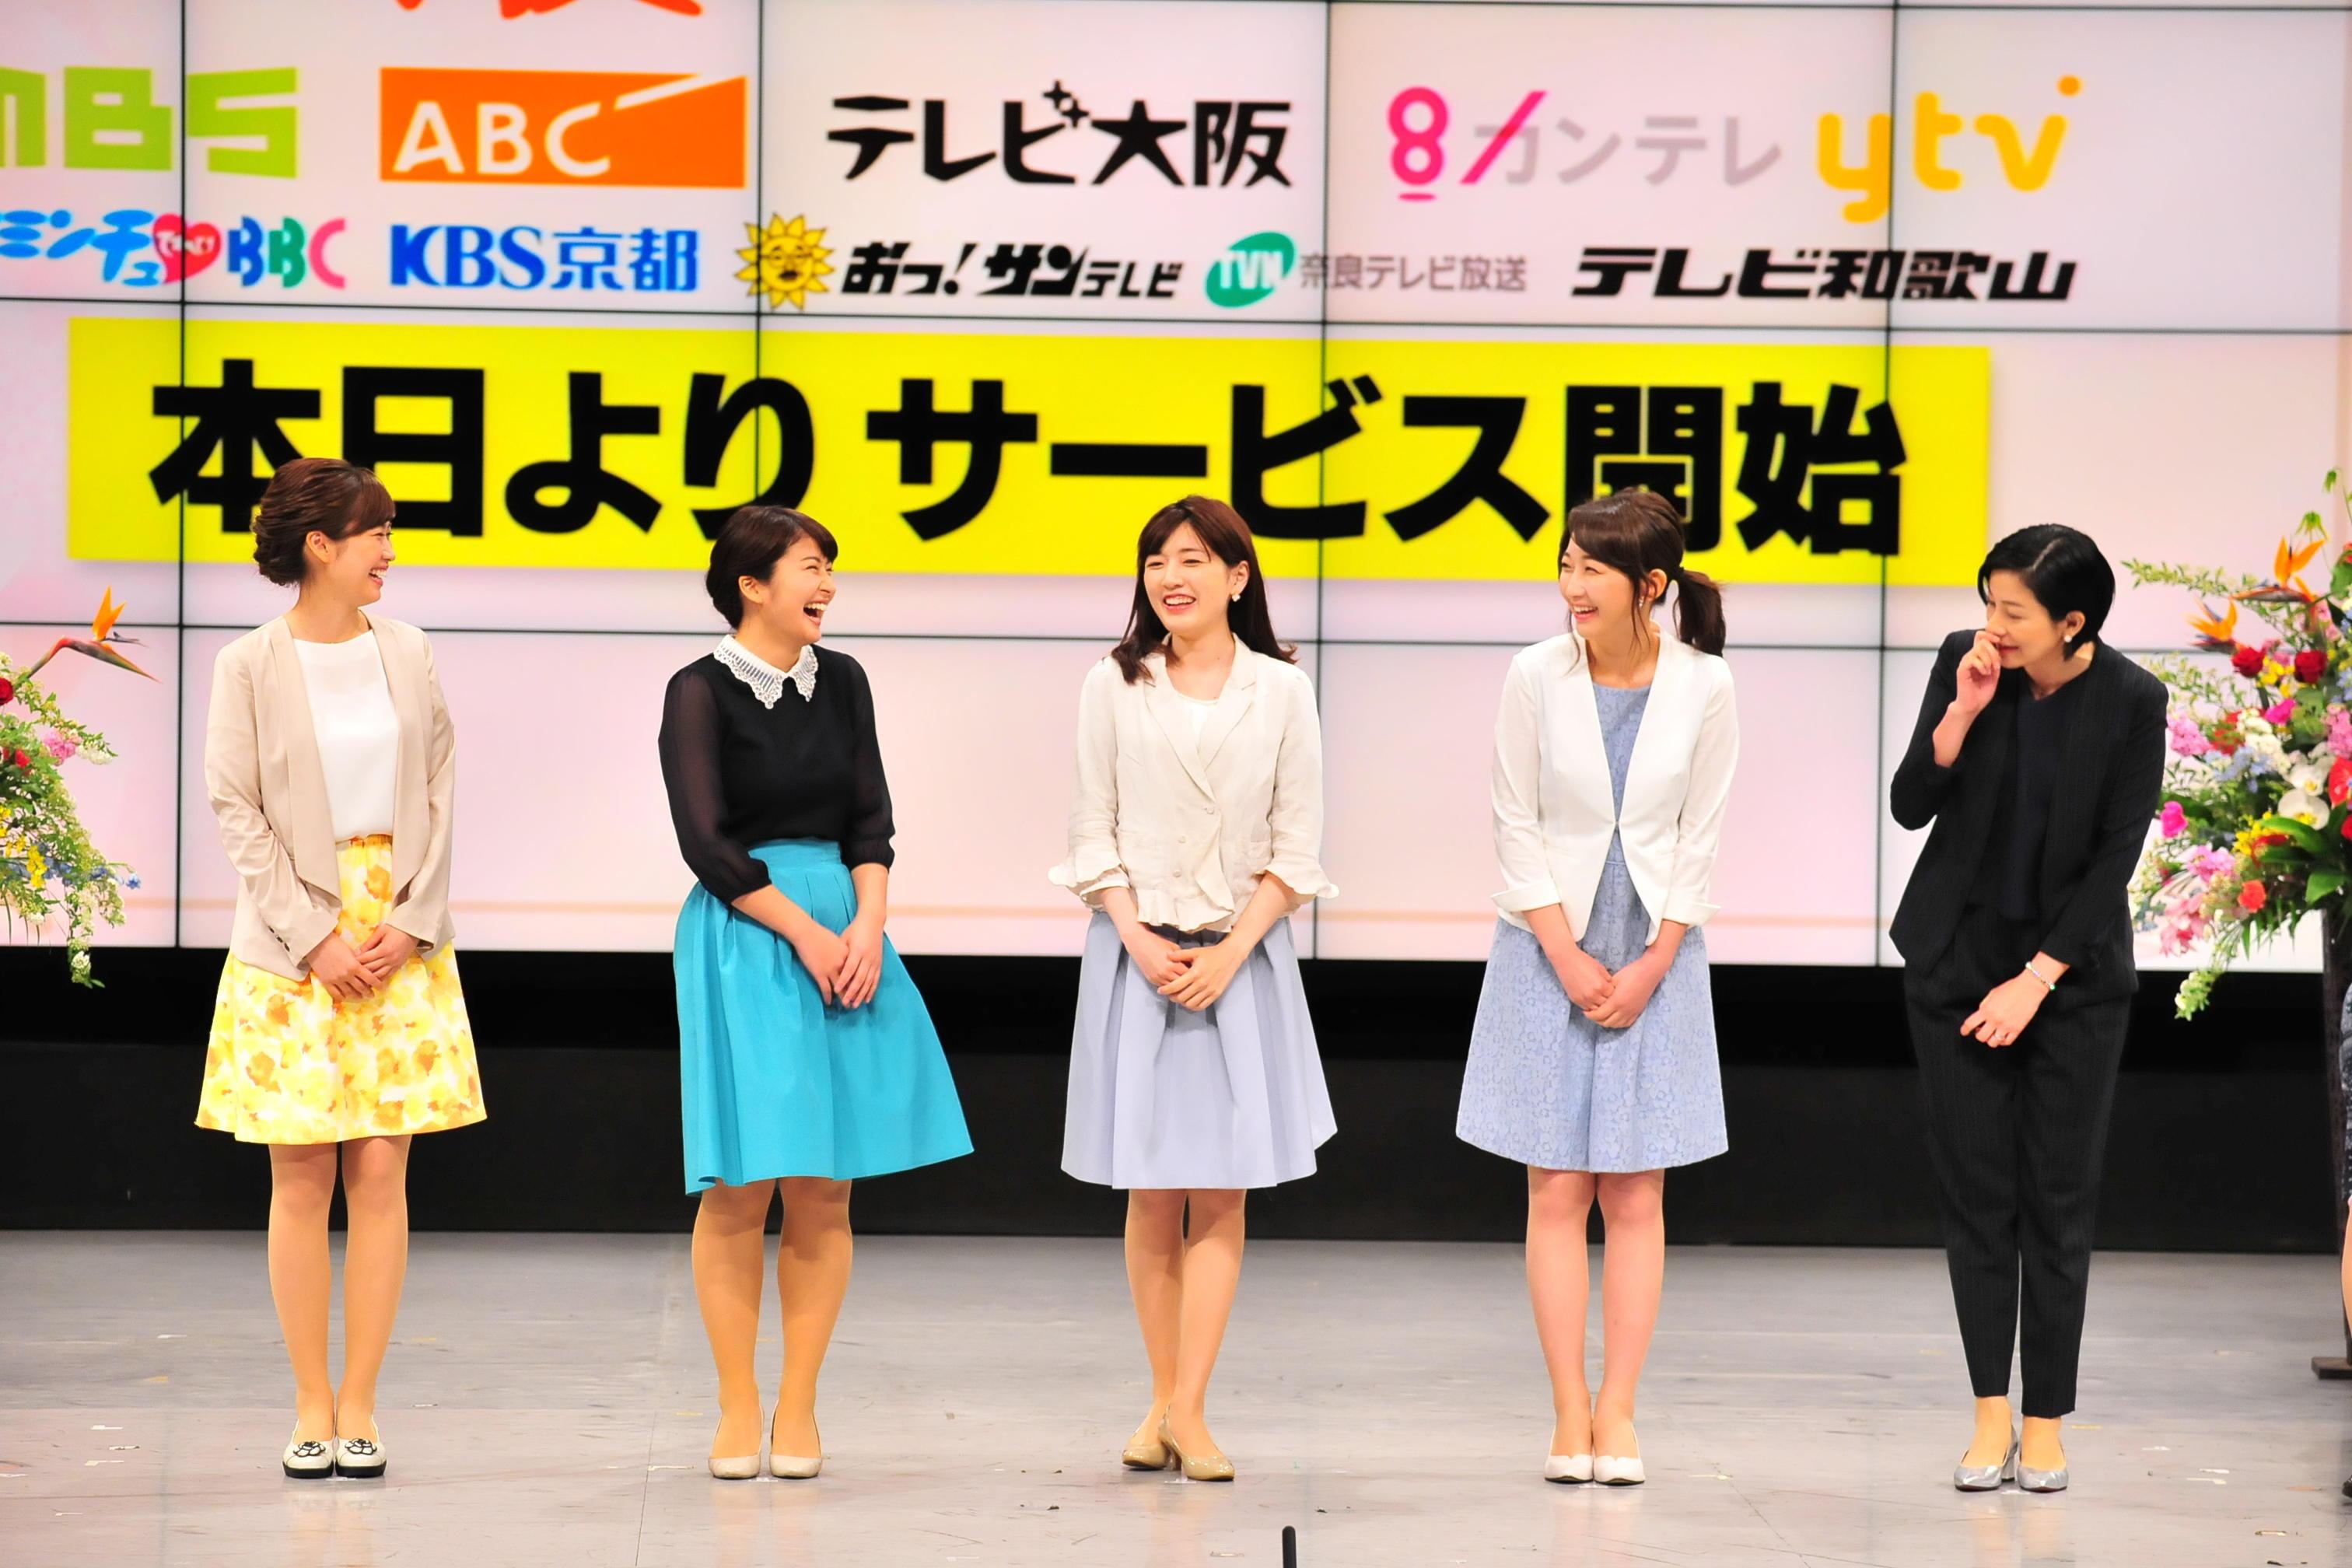 http://news.yoshimoto.co.jp/20170425160109-a8d32466f385cd86b4f5bf813858c73ddda4f2ec.jpg